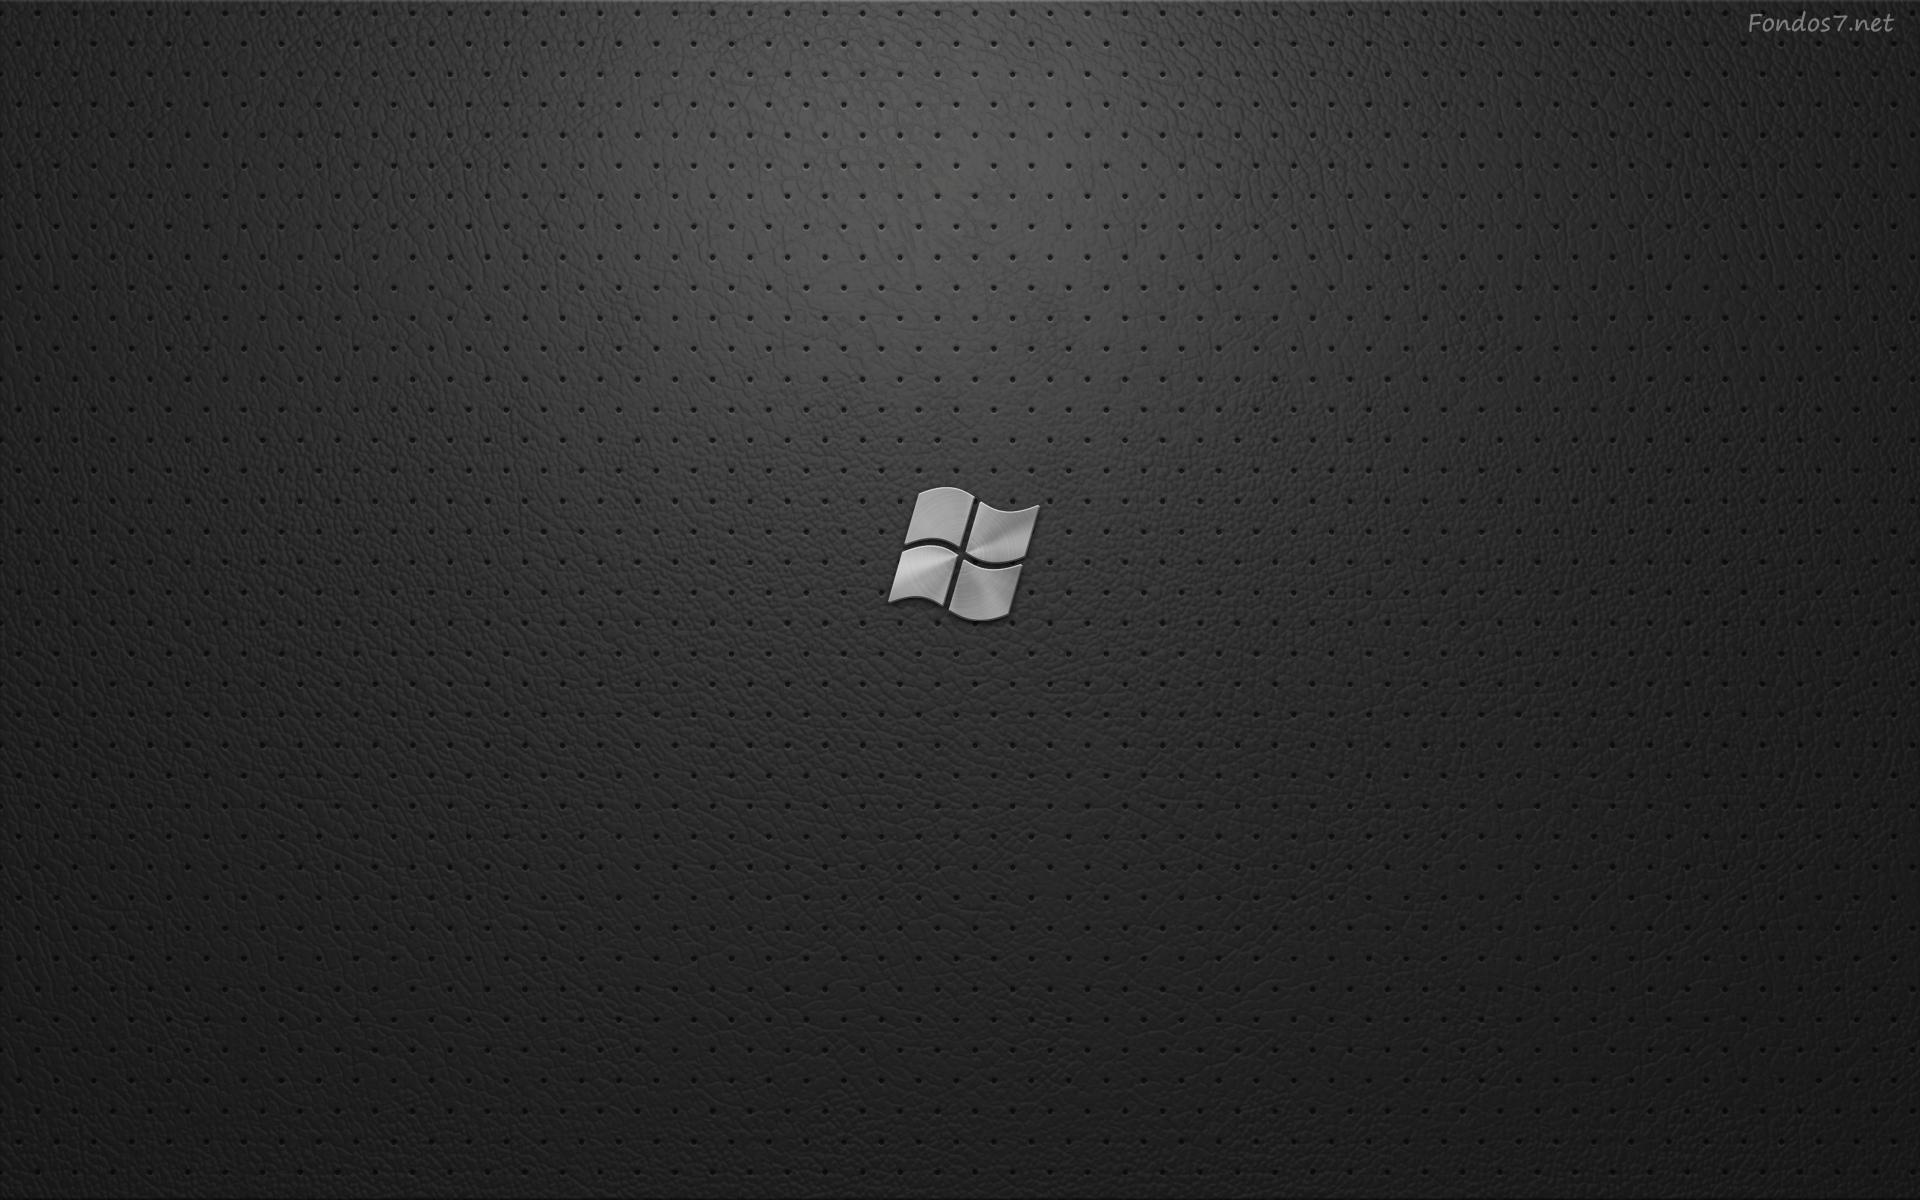 windows black wallpaper 20 background